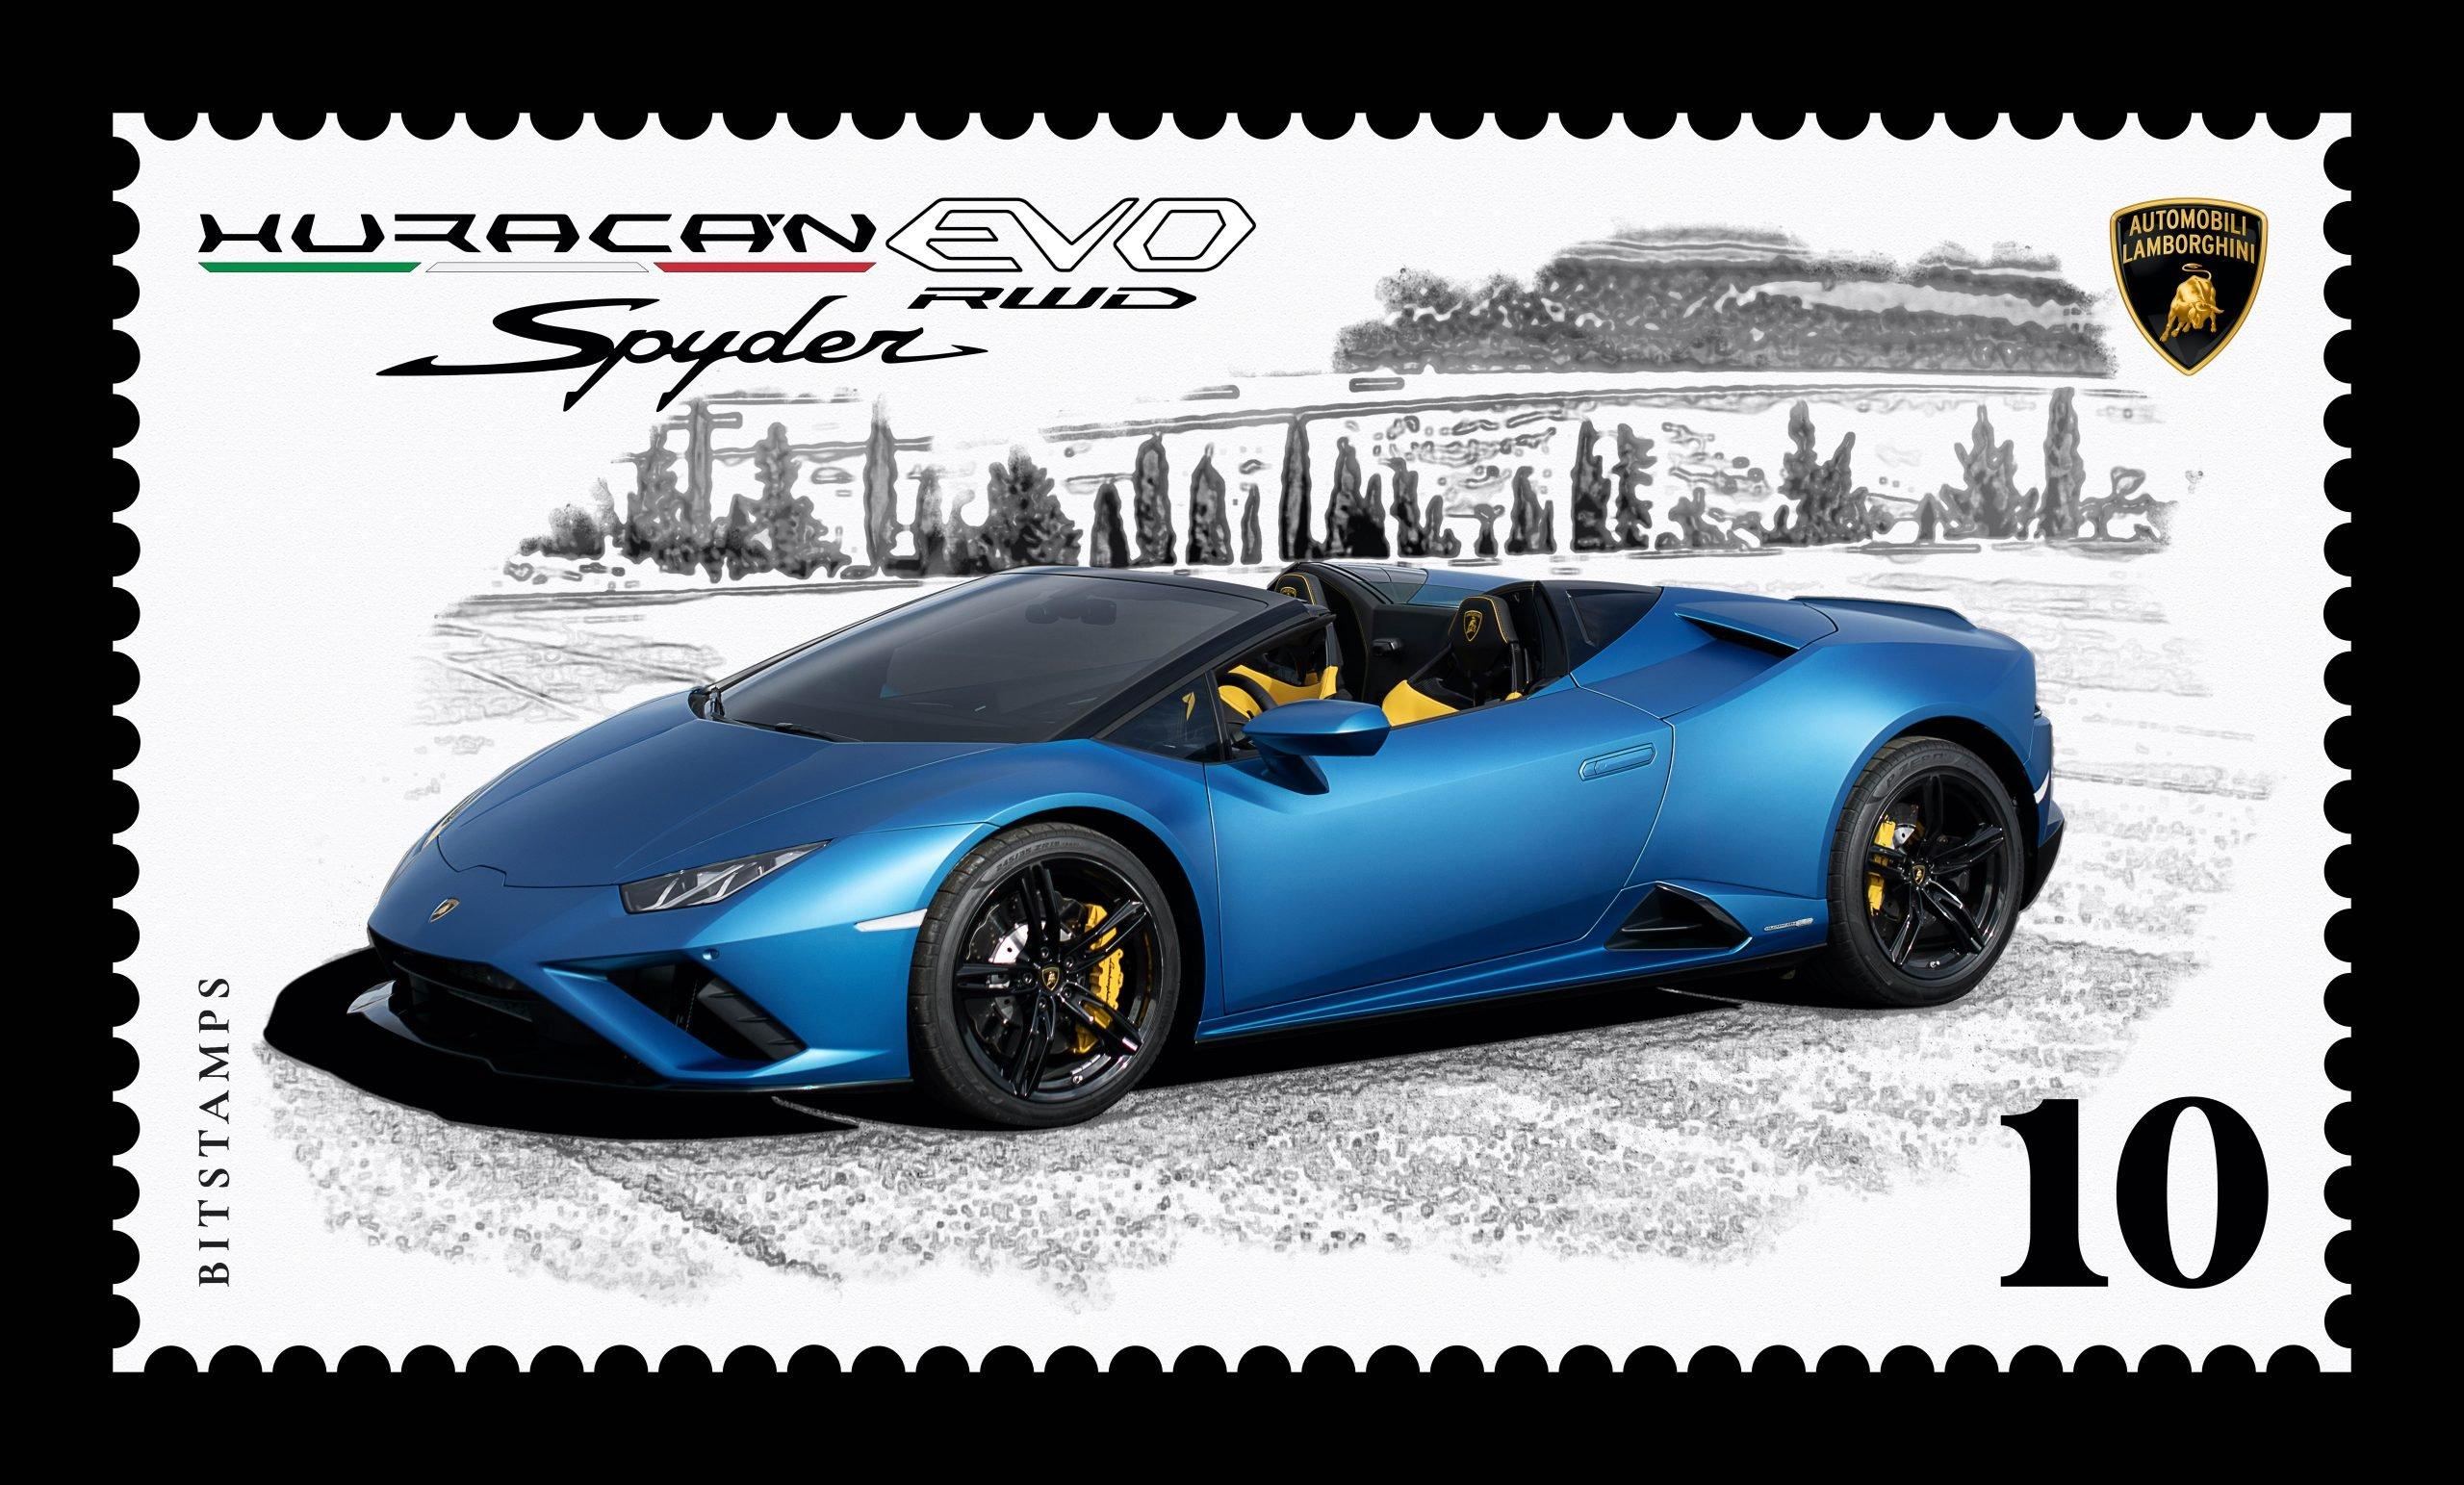 Суперкар Lamborghini появился на цифровой марке с технологией блокчейн